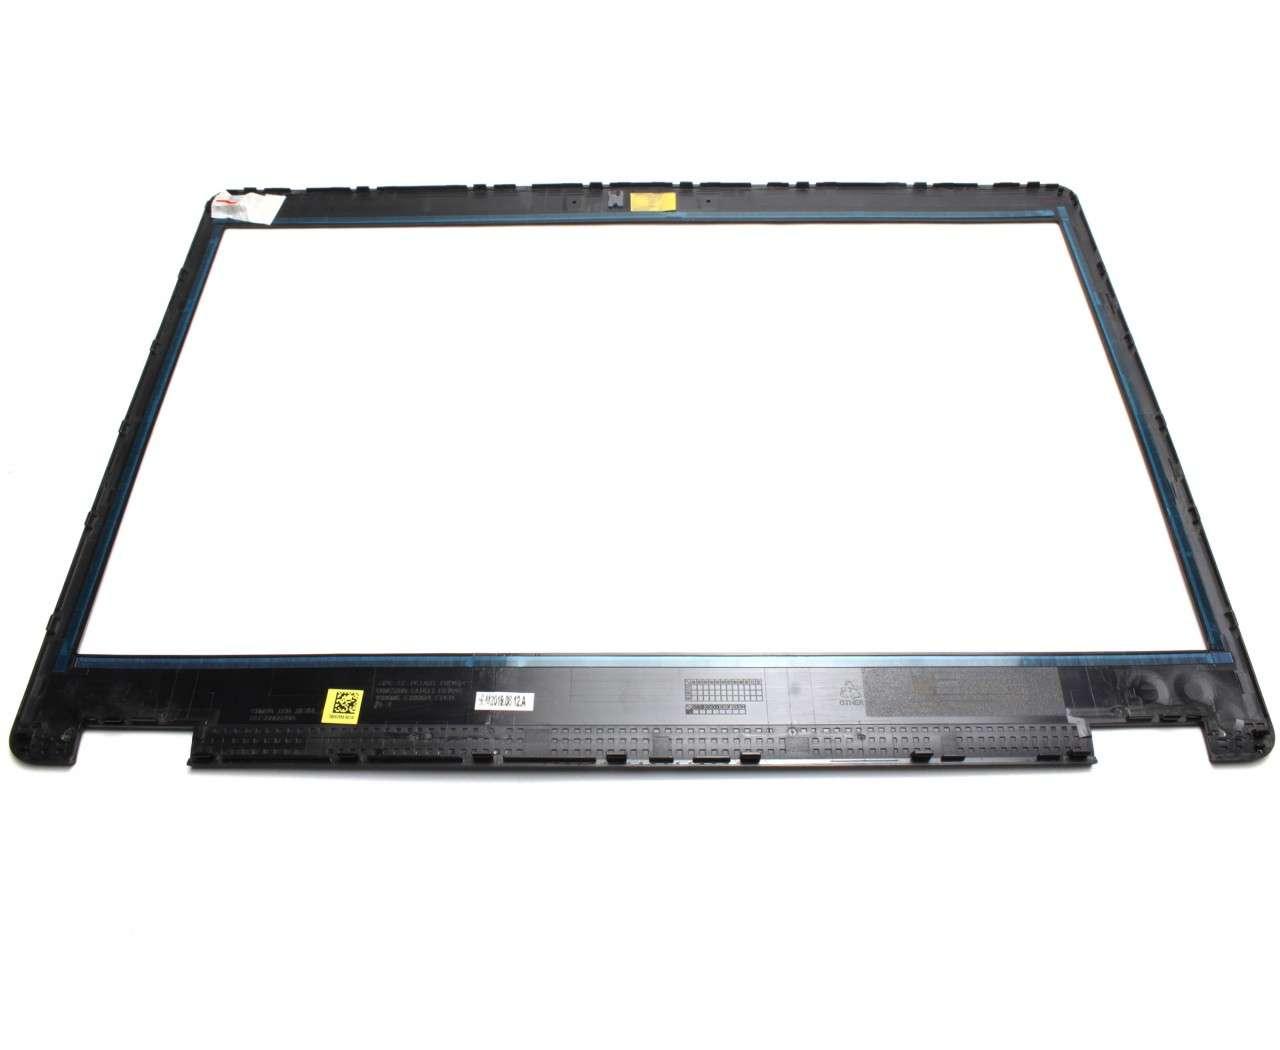 Rama Display Dell Latitude E3460 Bezel Front Cover Neagra imagine powerlaptop.ro 2021